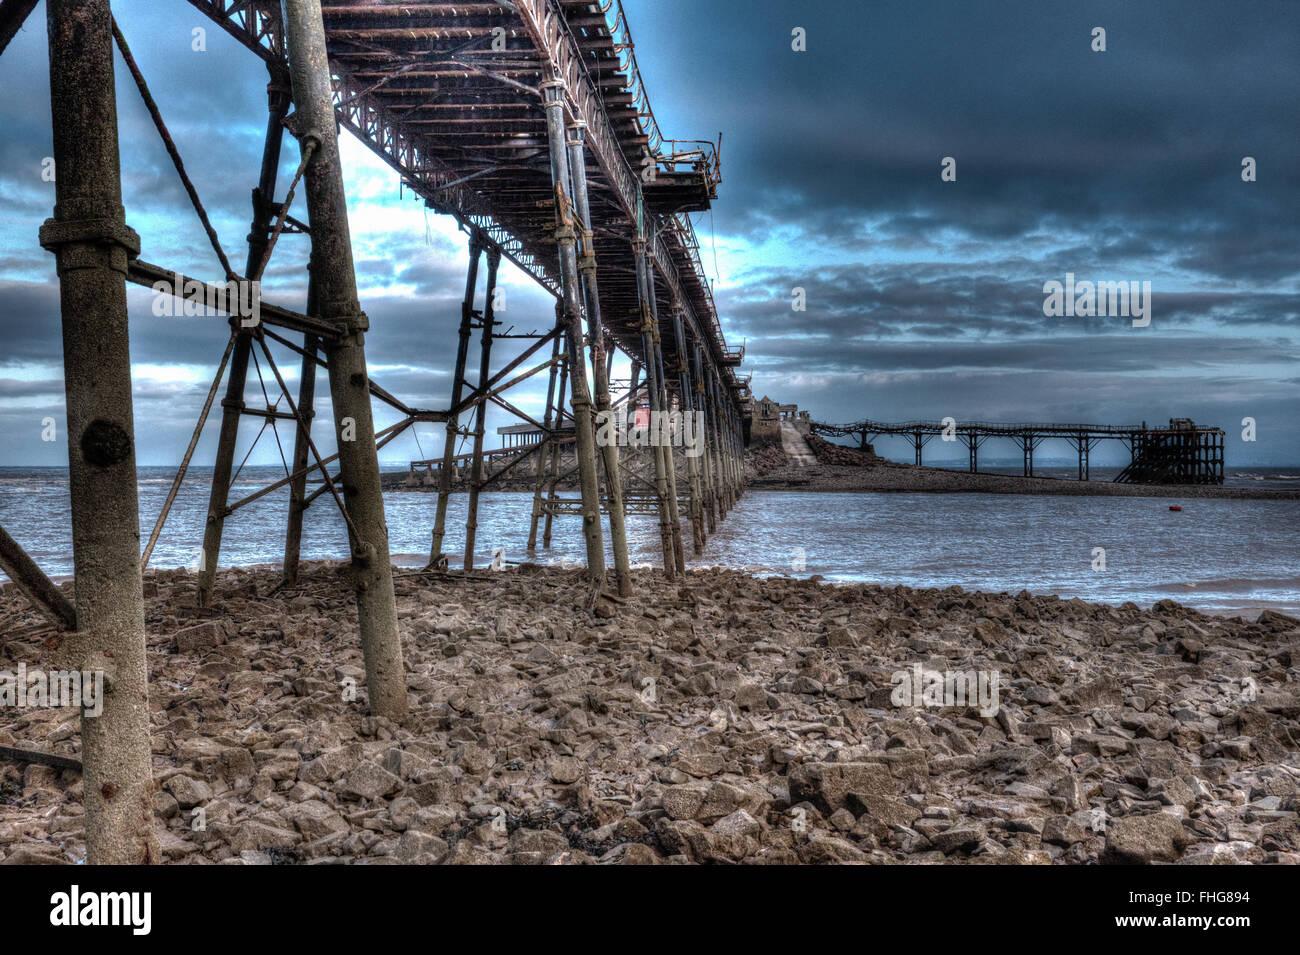 Birnbeck Pier Weston-super-Mare Somerset England in unique creative different  HDR - Stock Image